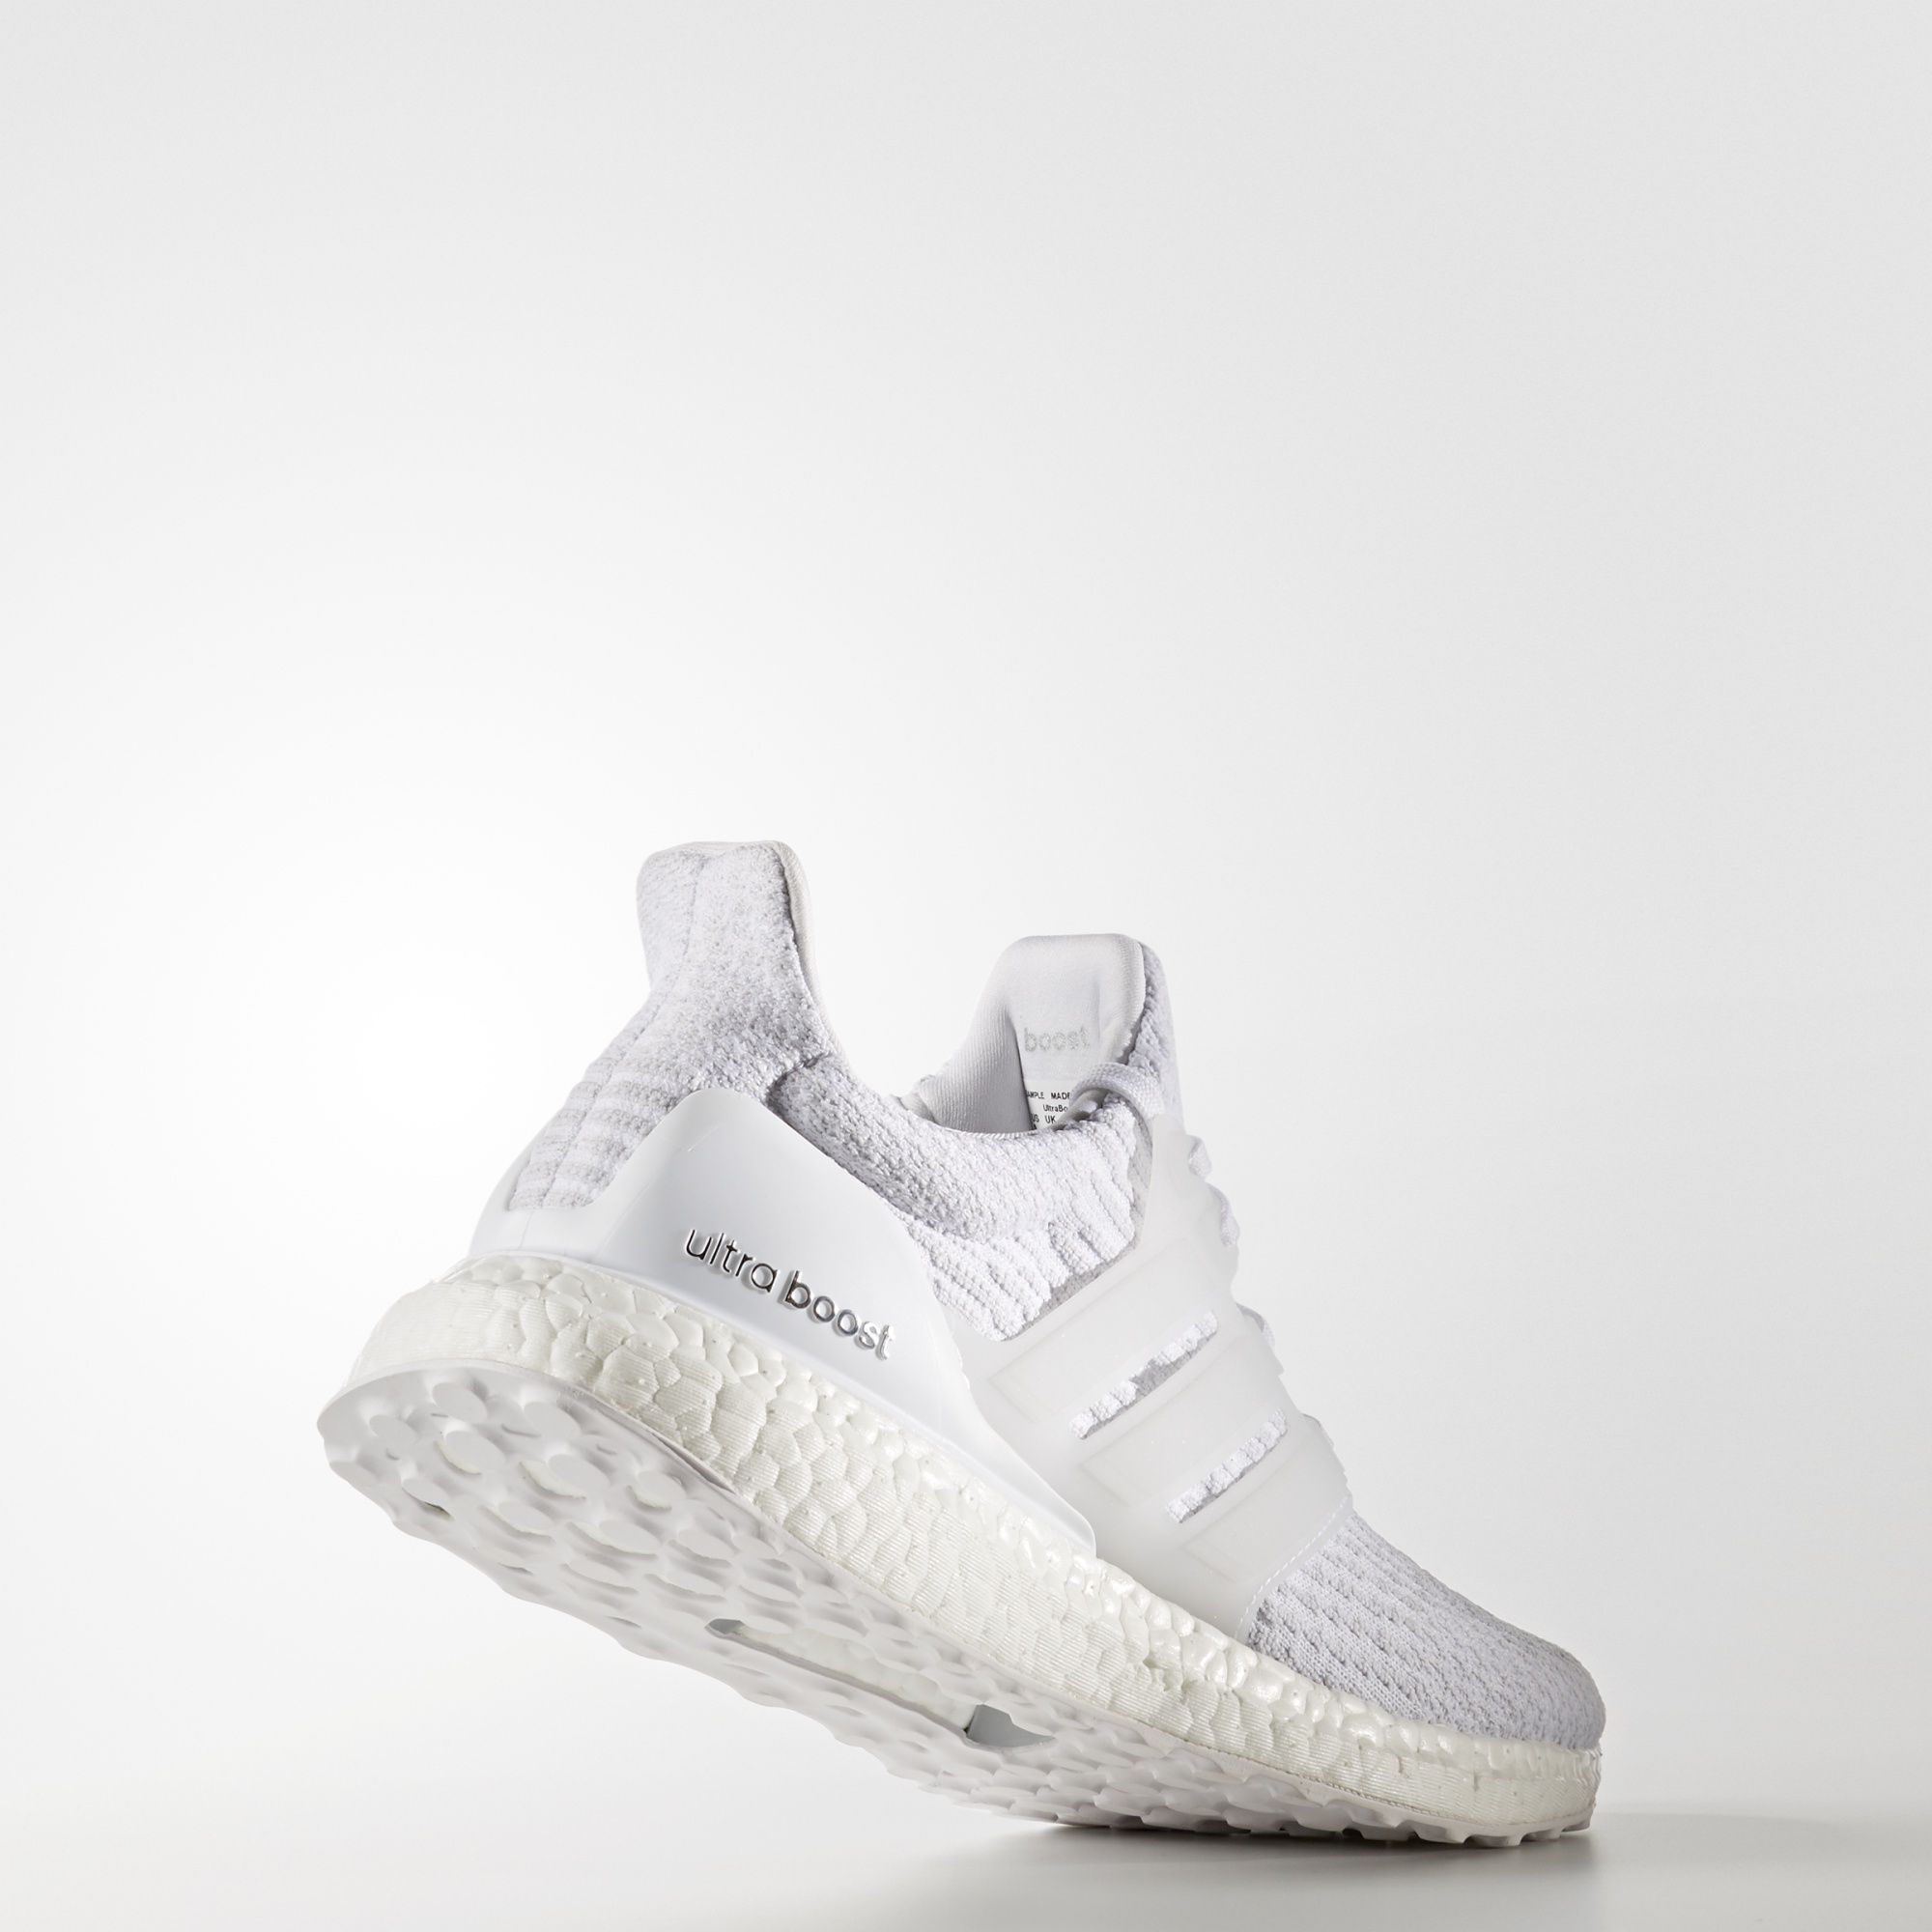 adidas Ultra Boost 3 0 Triple White BA8841 5